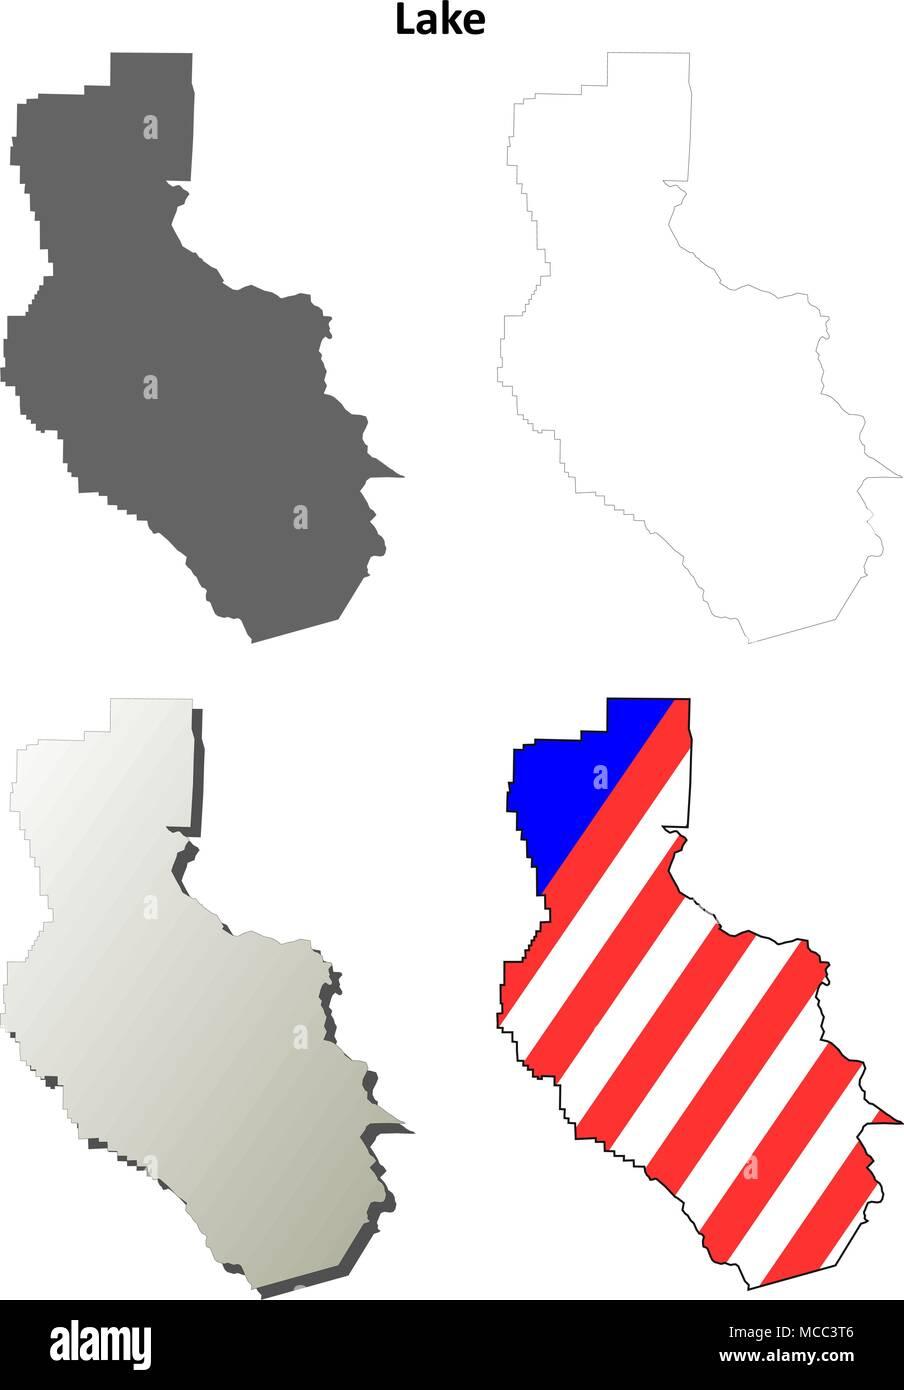 Lake County, California outline map set Stock Vector Art ... on